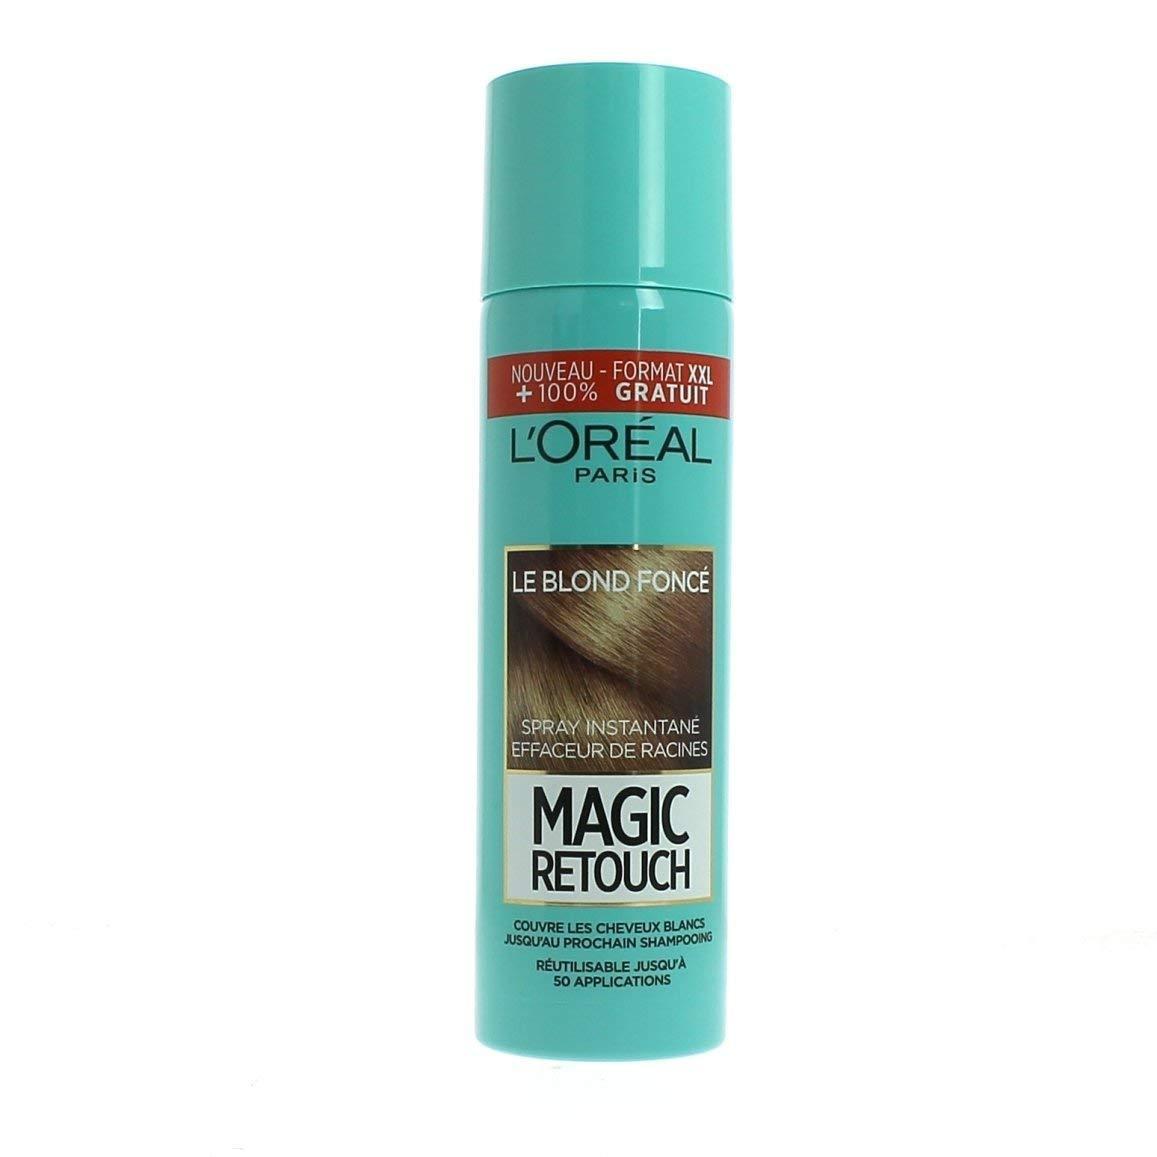 MAXI FORMATO!!Magic Retouch effaceur di radice l' Oréal Paris BIONDO SCURO